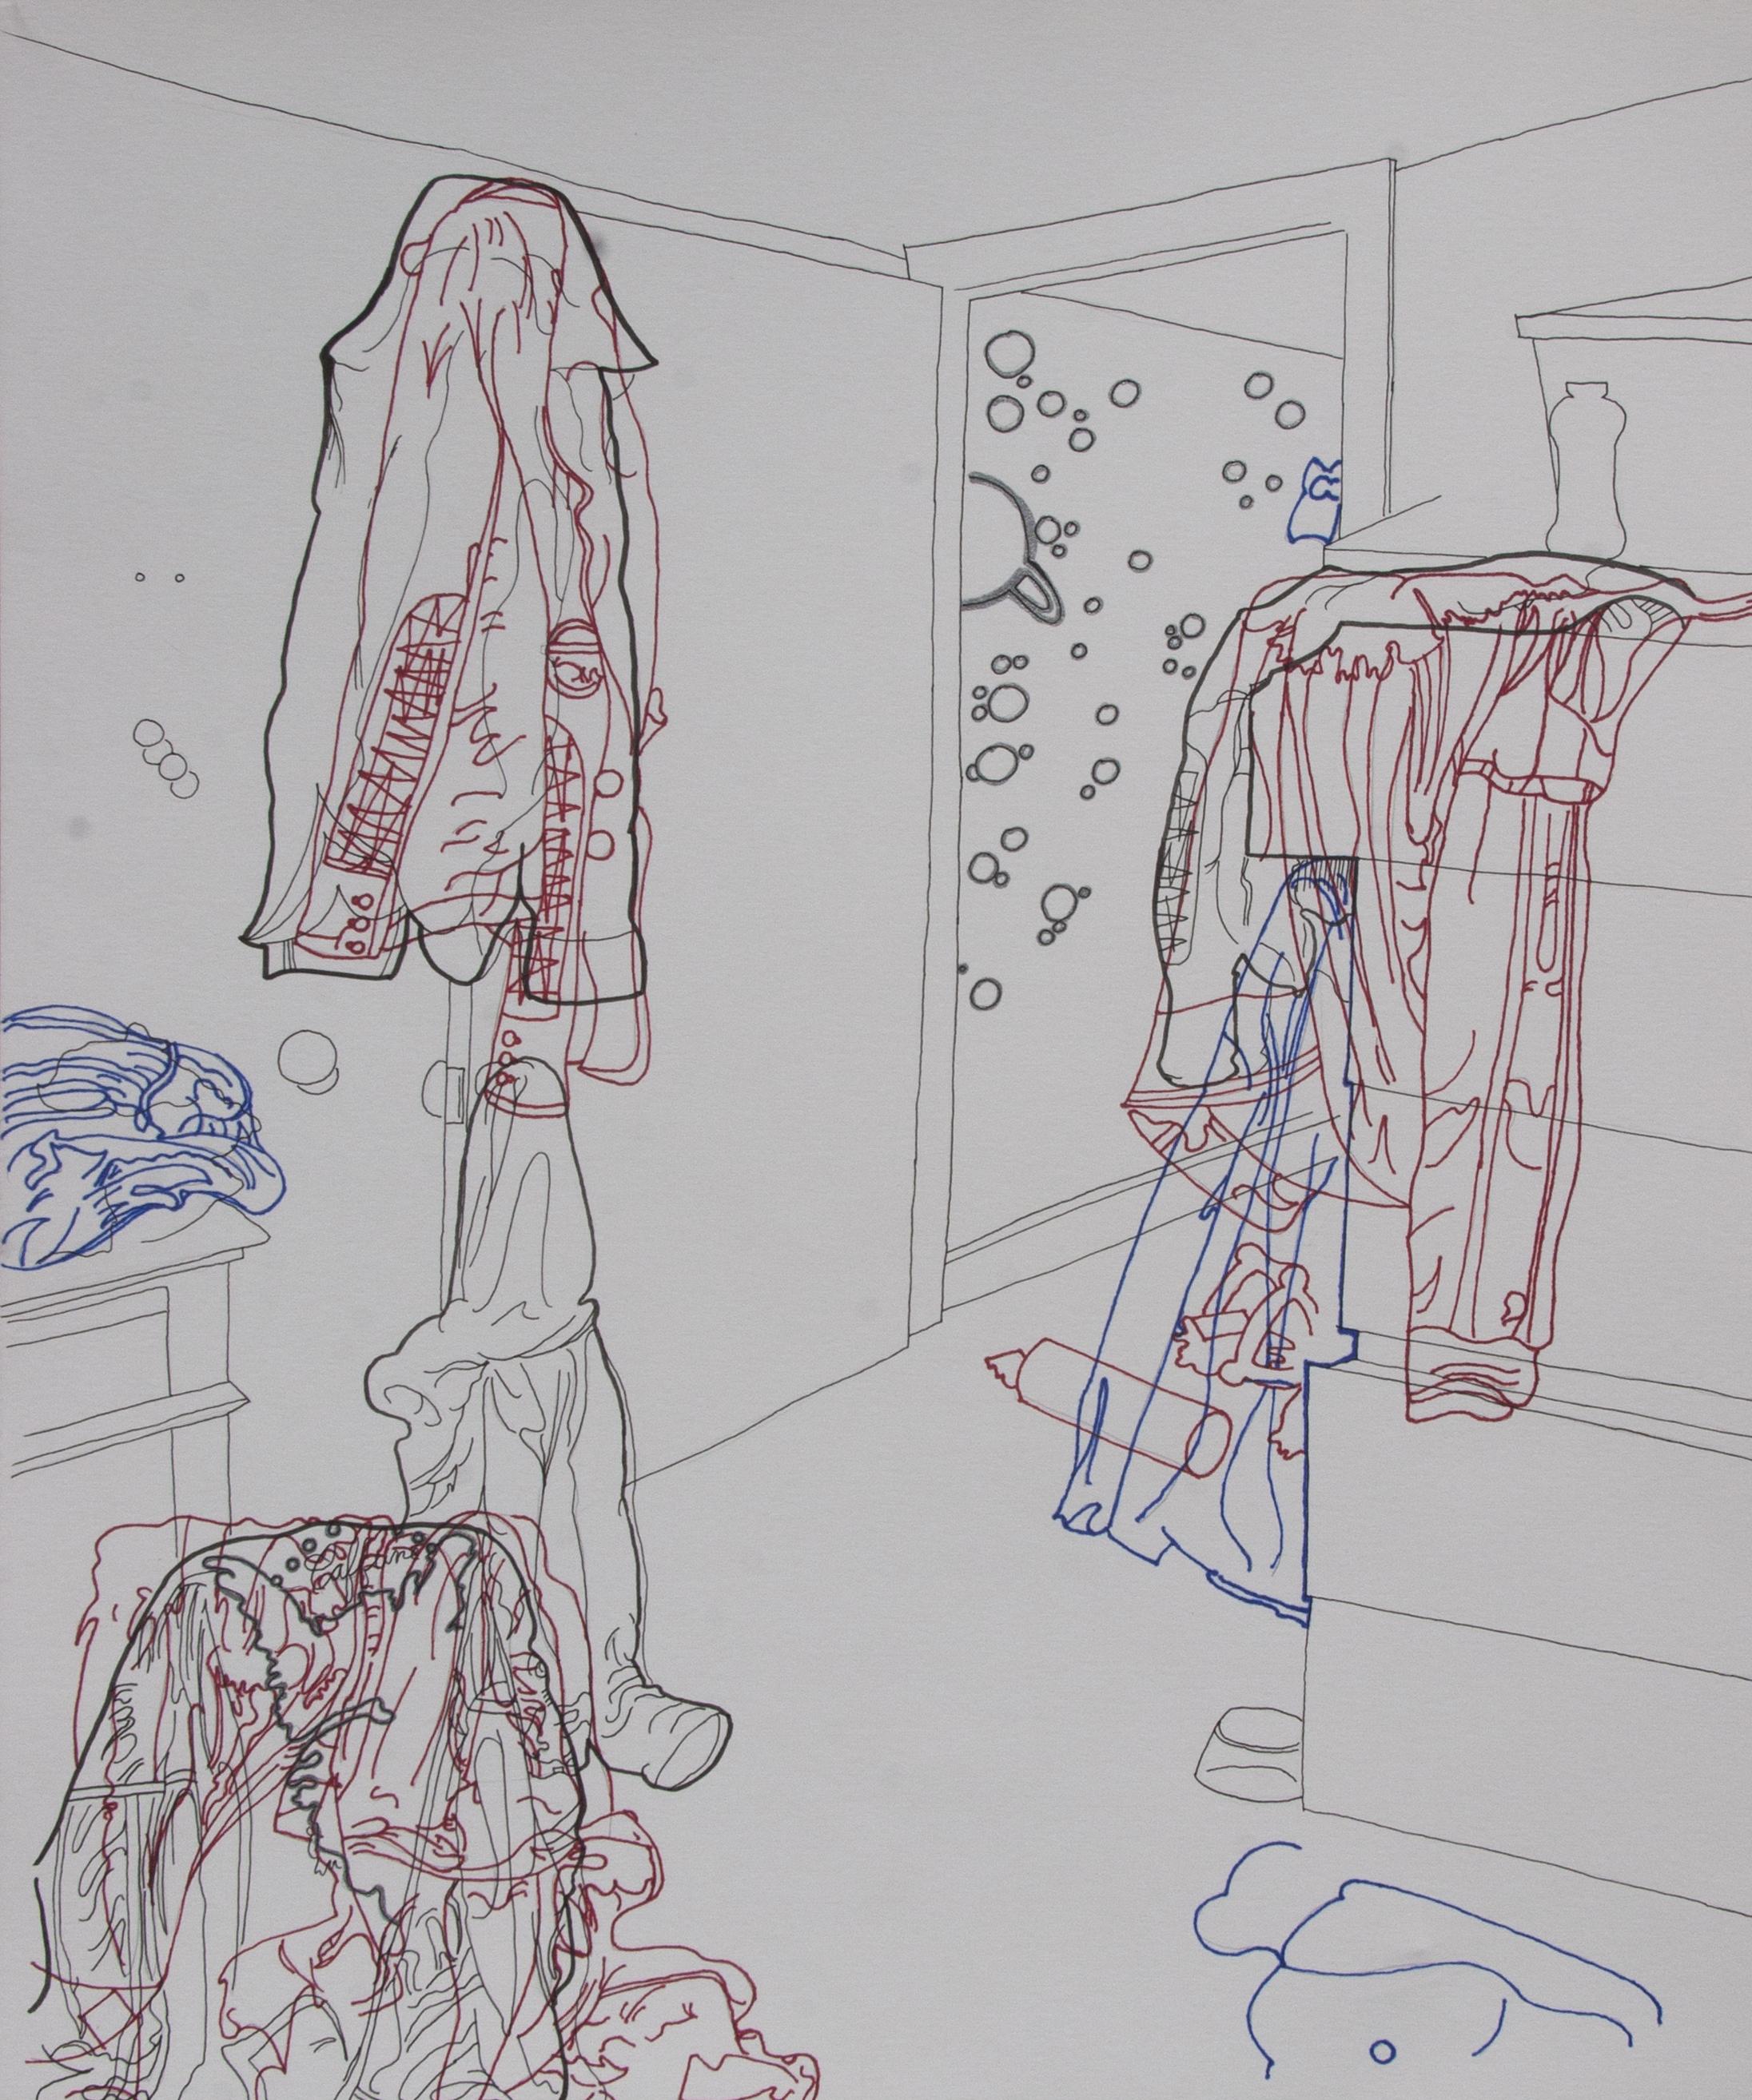 drawing1-2014-line-10.jpg